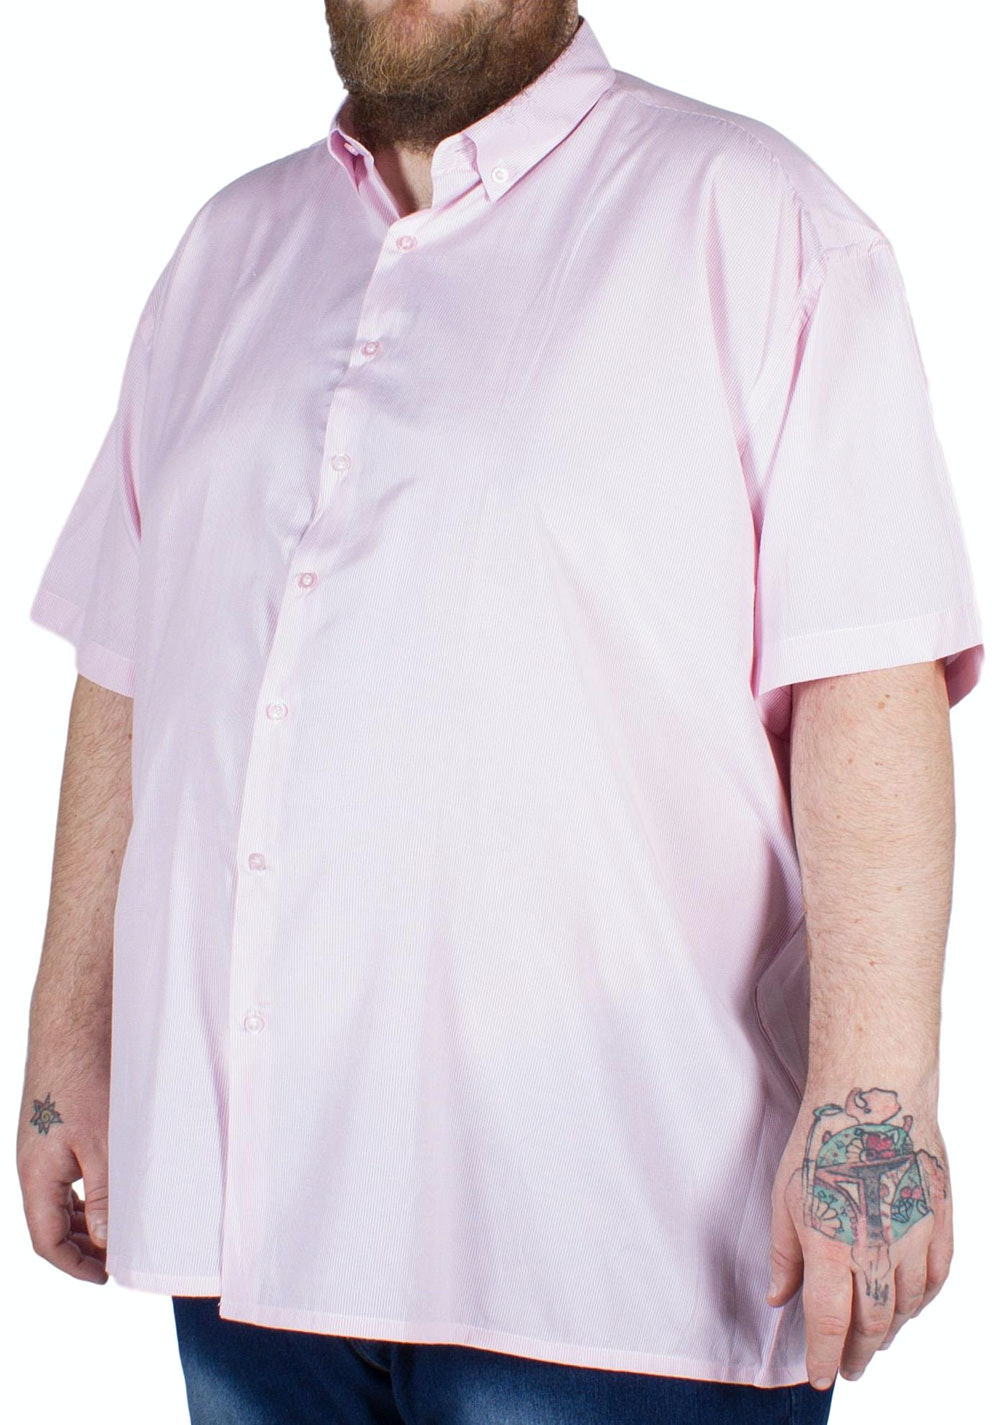 Fitzgerald Spain Short Sleeve Striped Shirt Pink